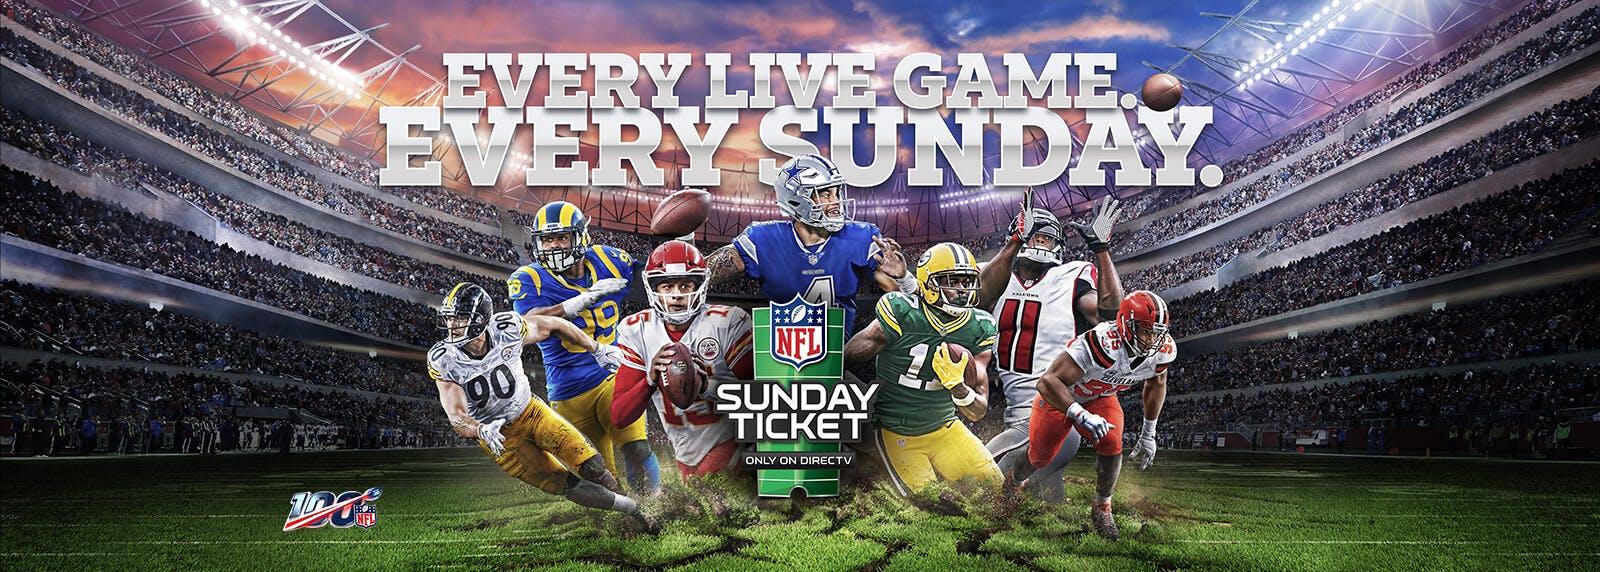 watch seahawks vs ravens live stream nfl sunday ticket